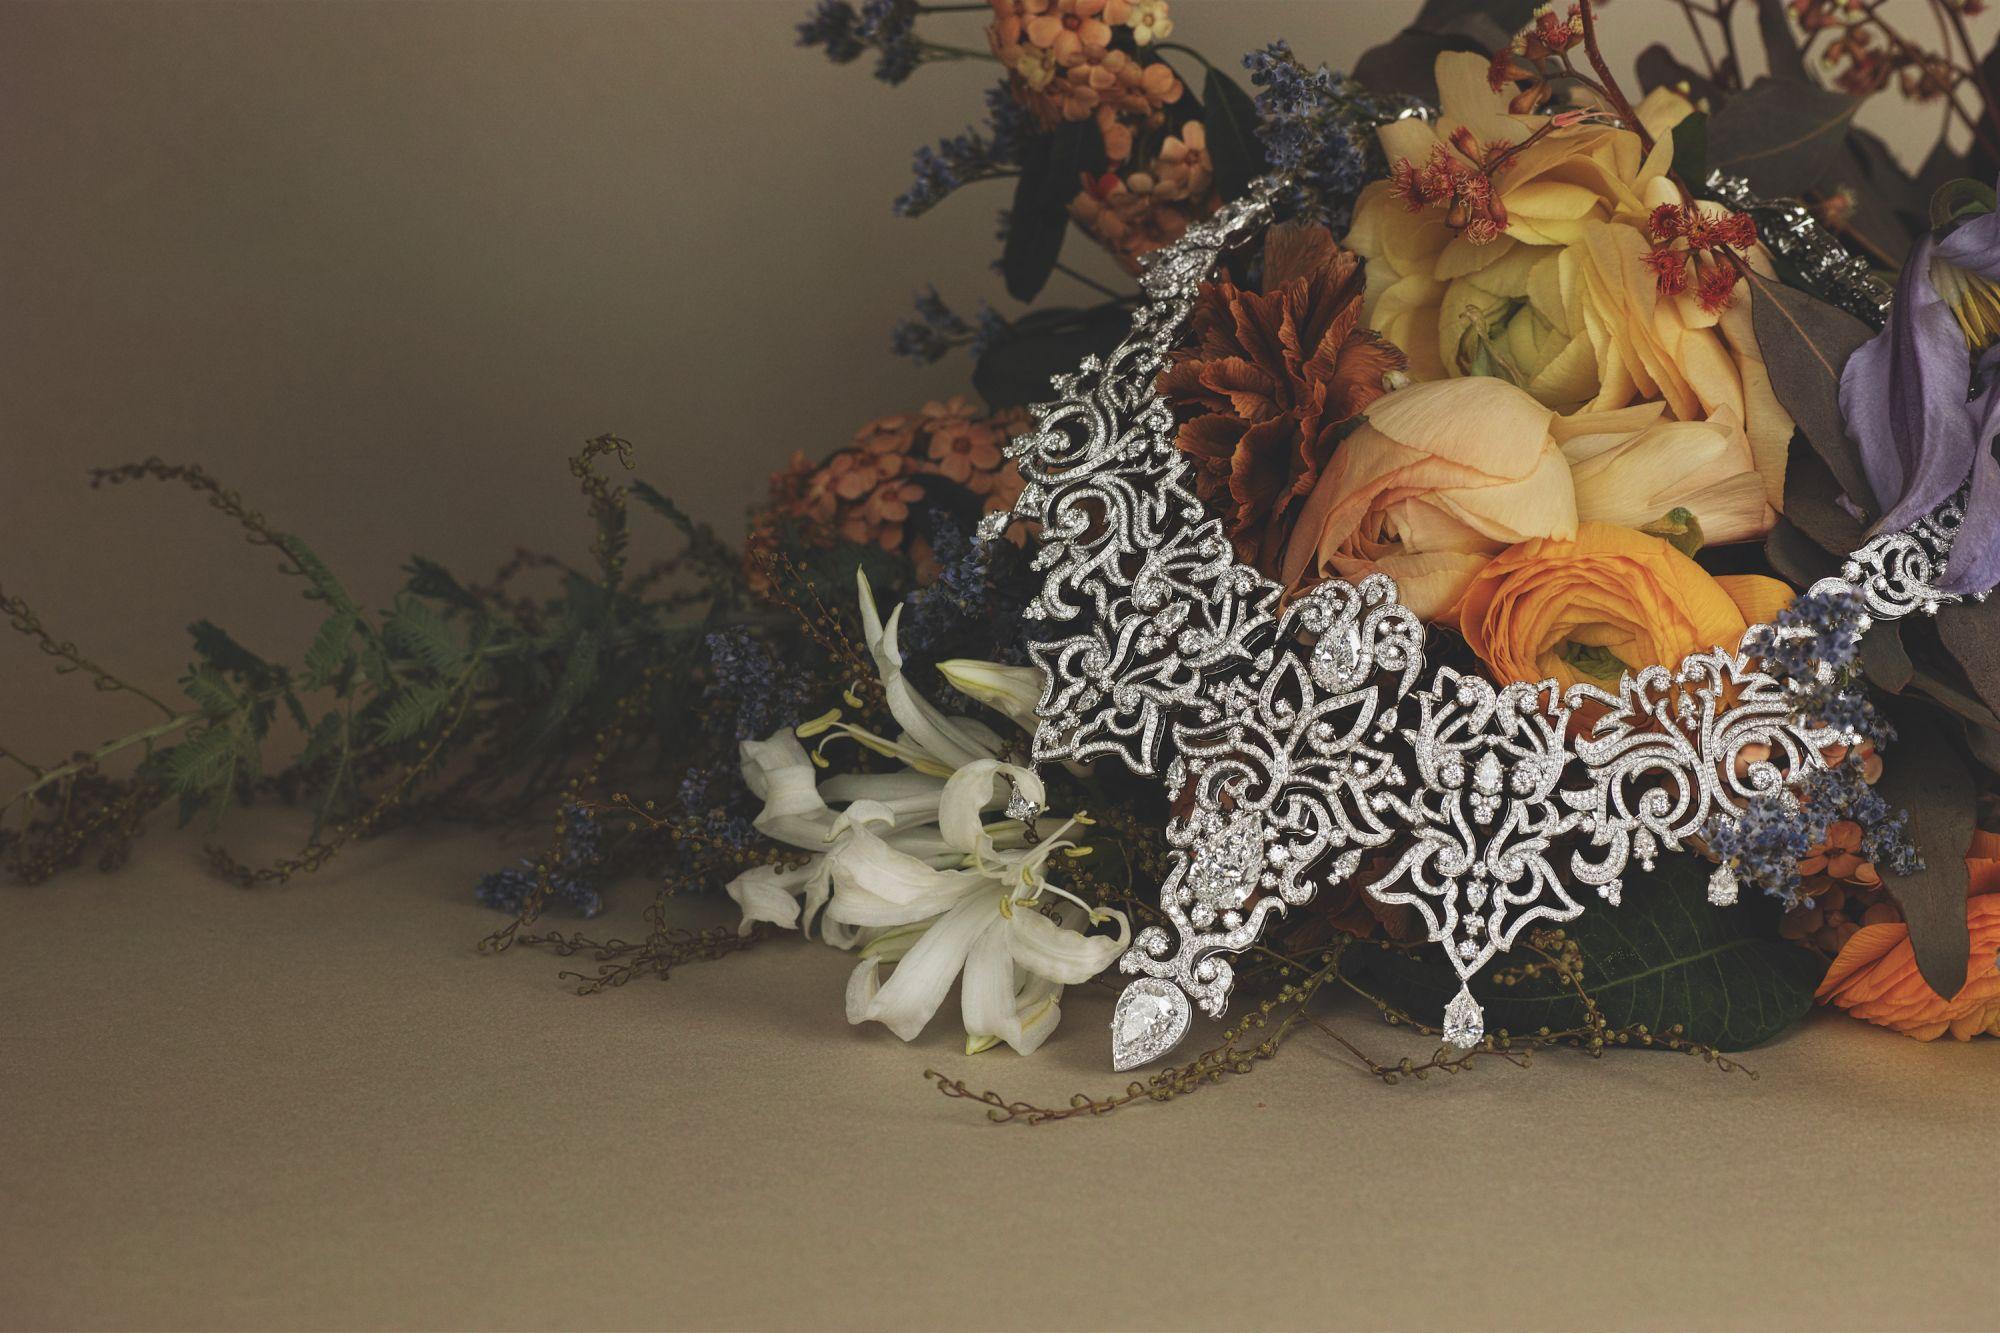 Grottesche necklace in white gold set with multi-shaped white diamonds by Giampiero Bodino